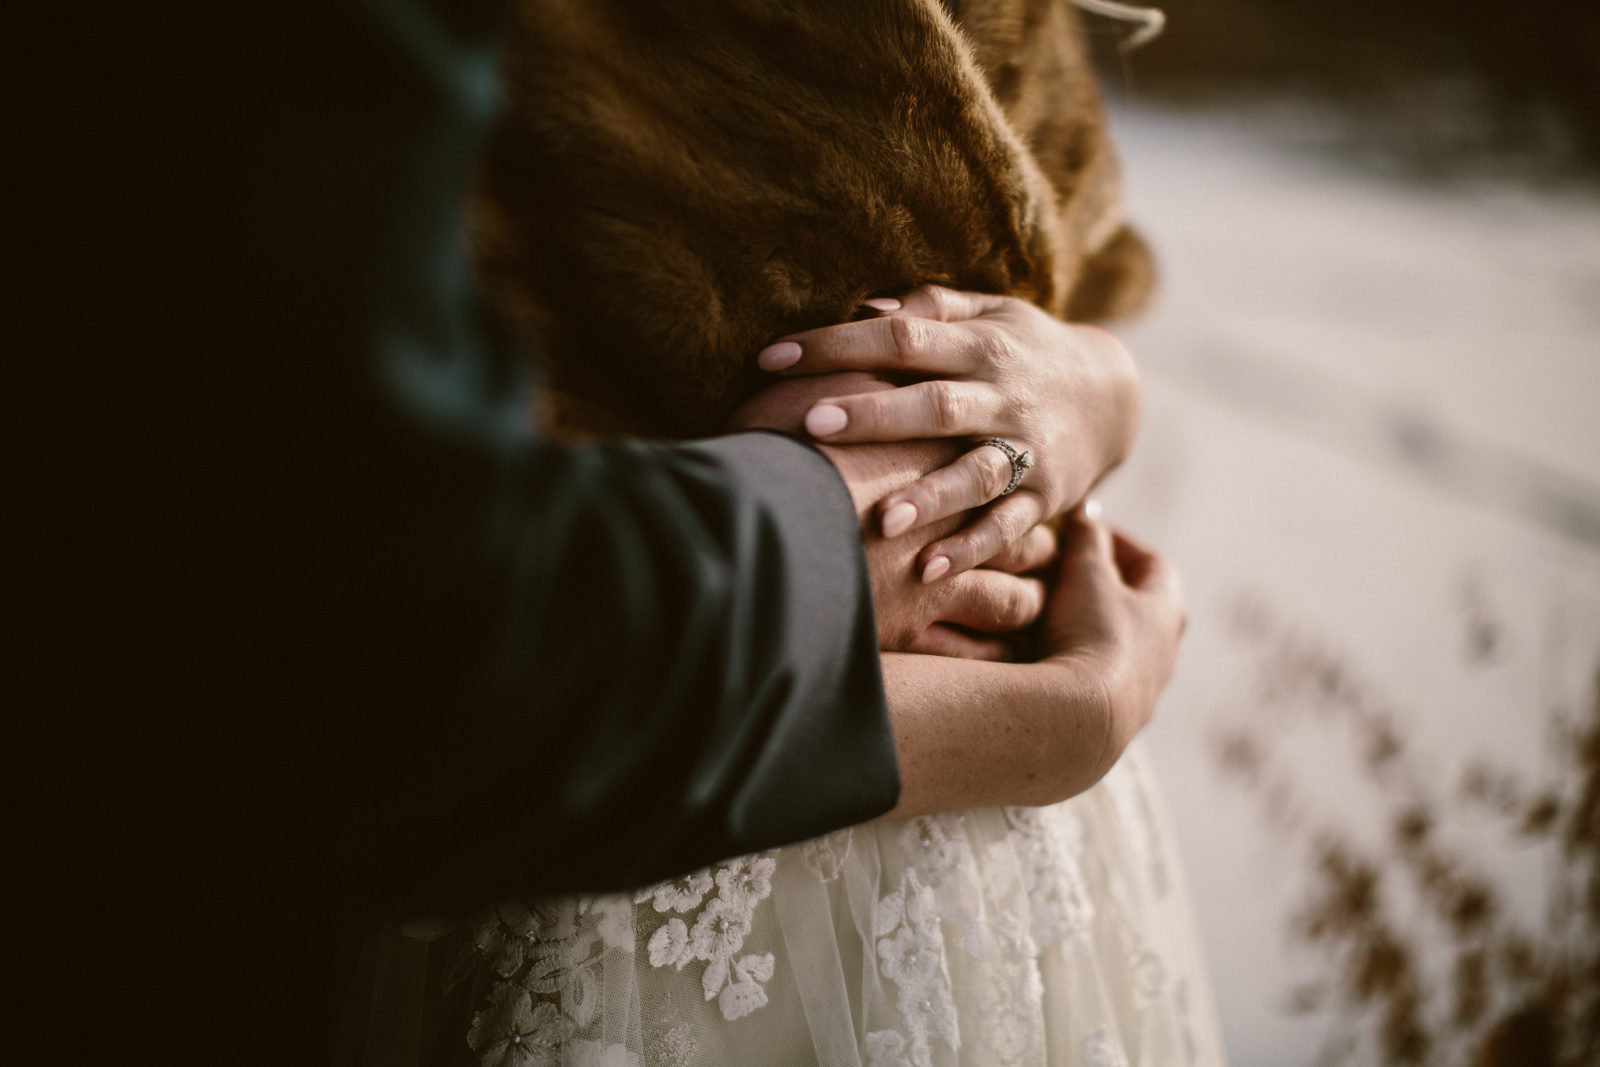 Idaho_wedding_photography_11-1600x1067.jpg